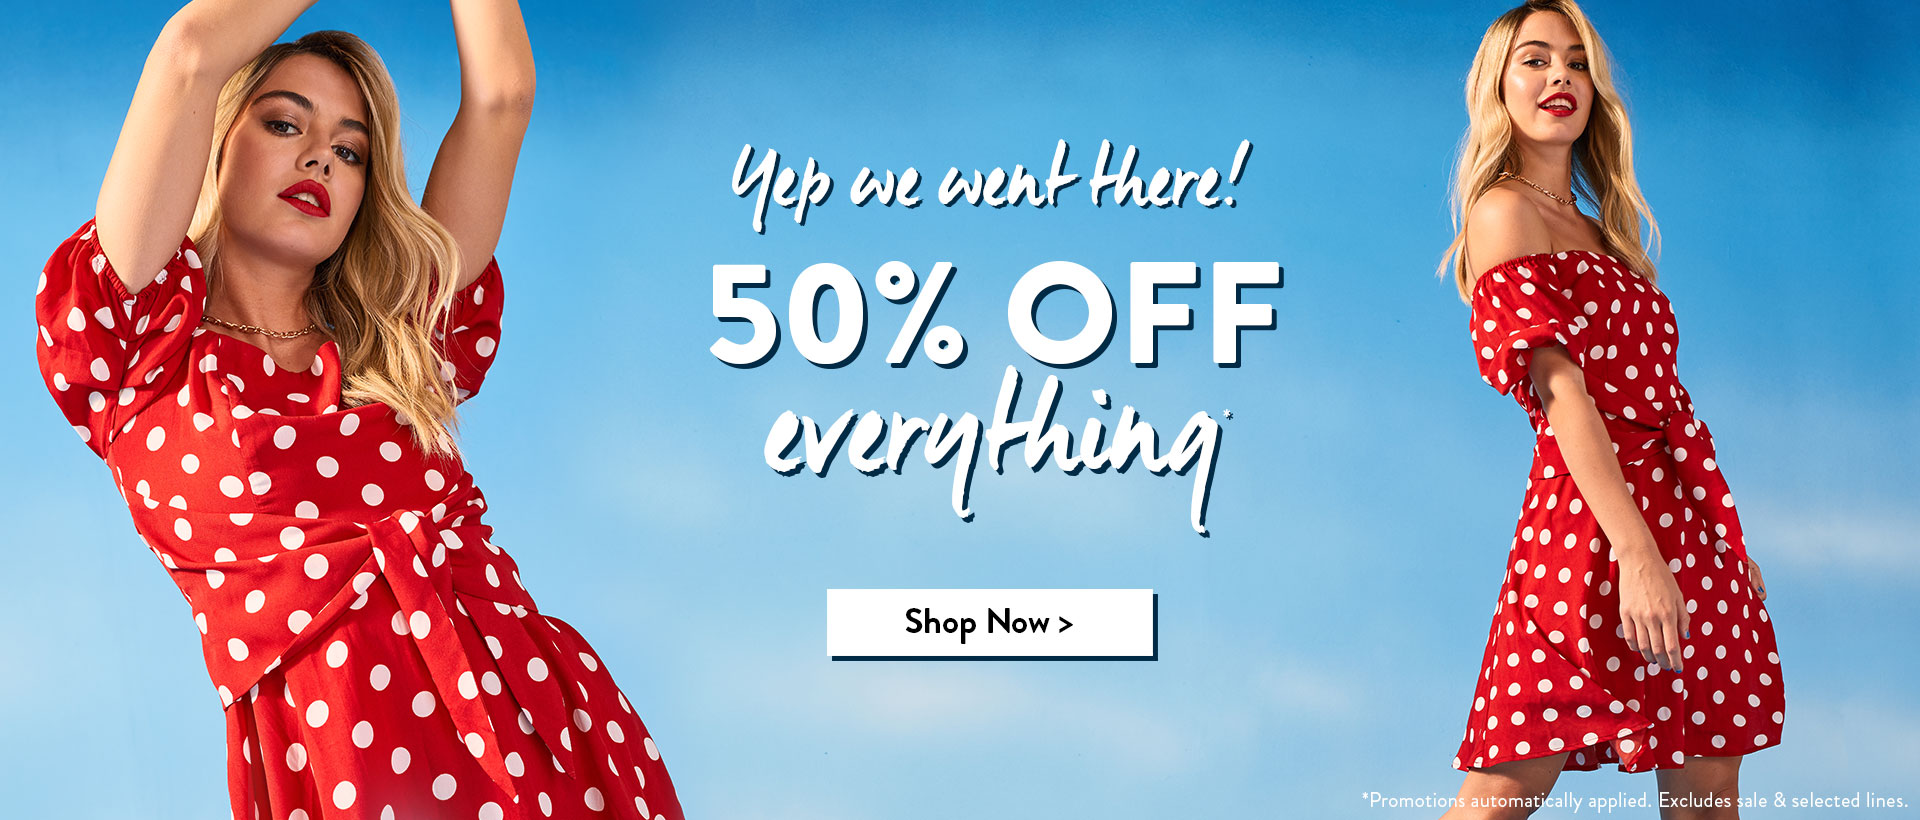 Clothes | Women\'s & Men\'s Clothing & Fashion | Online Shopping – boohoo